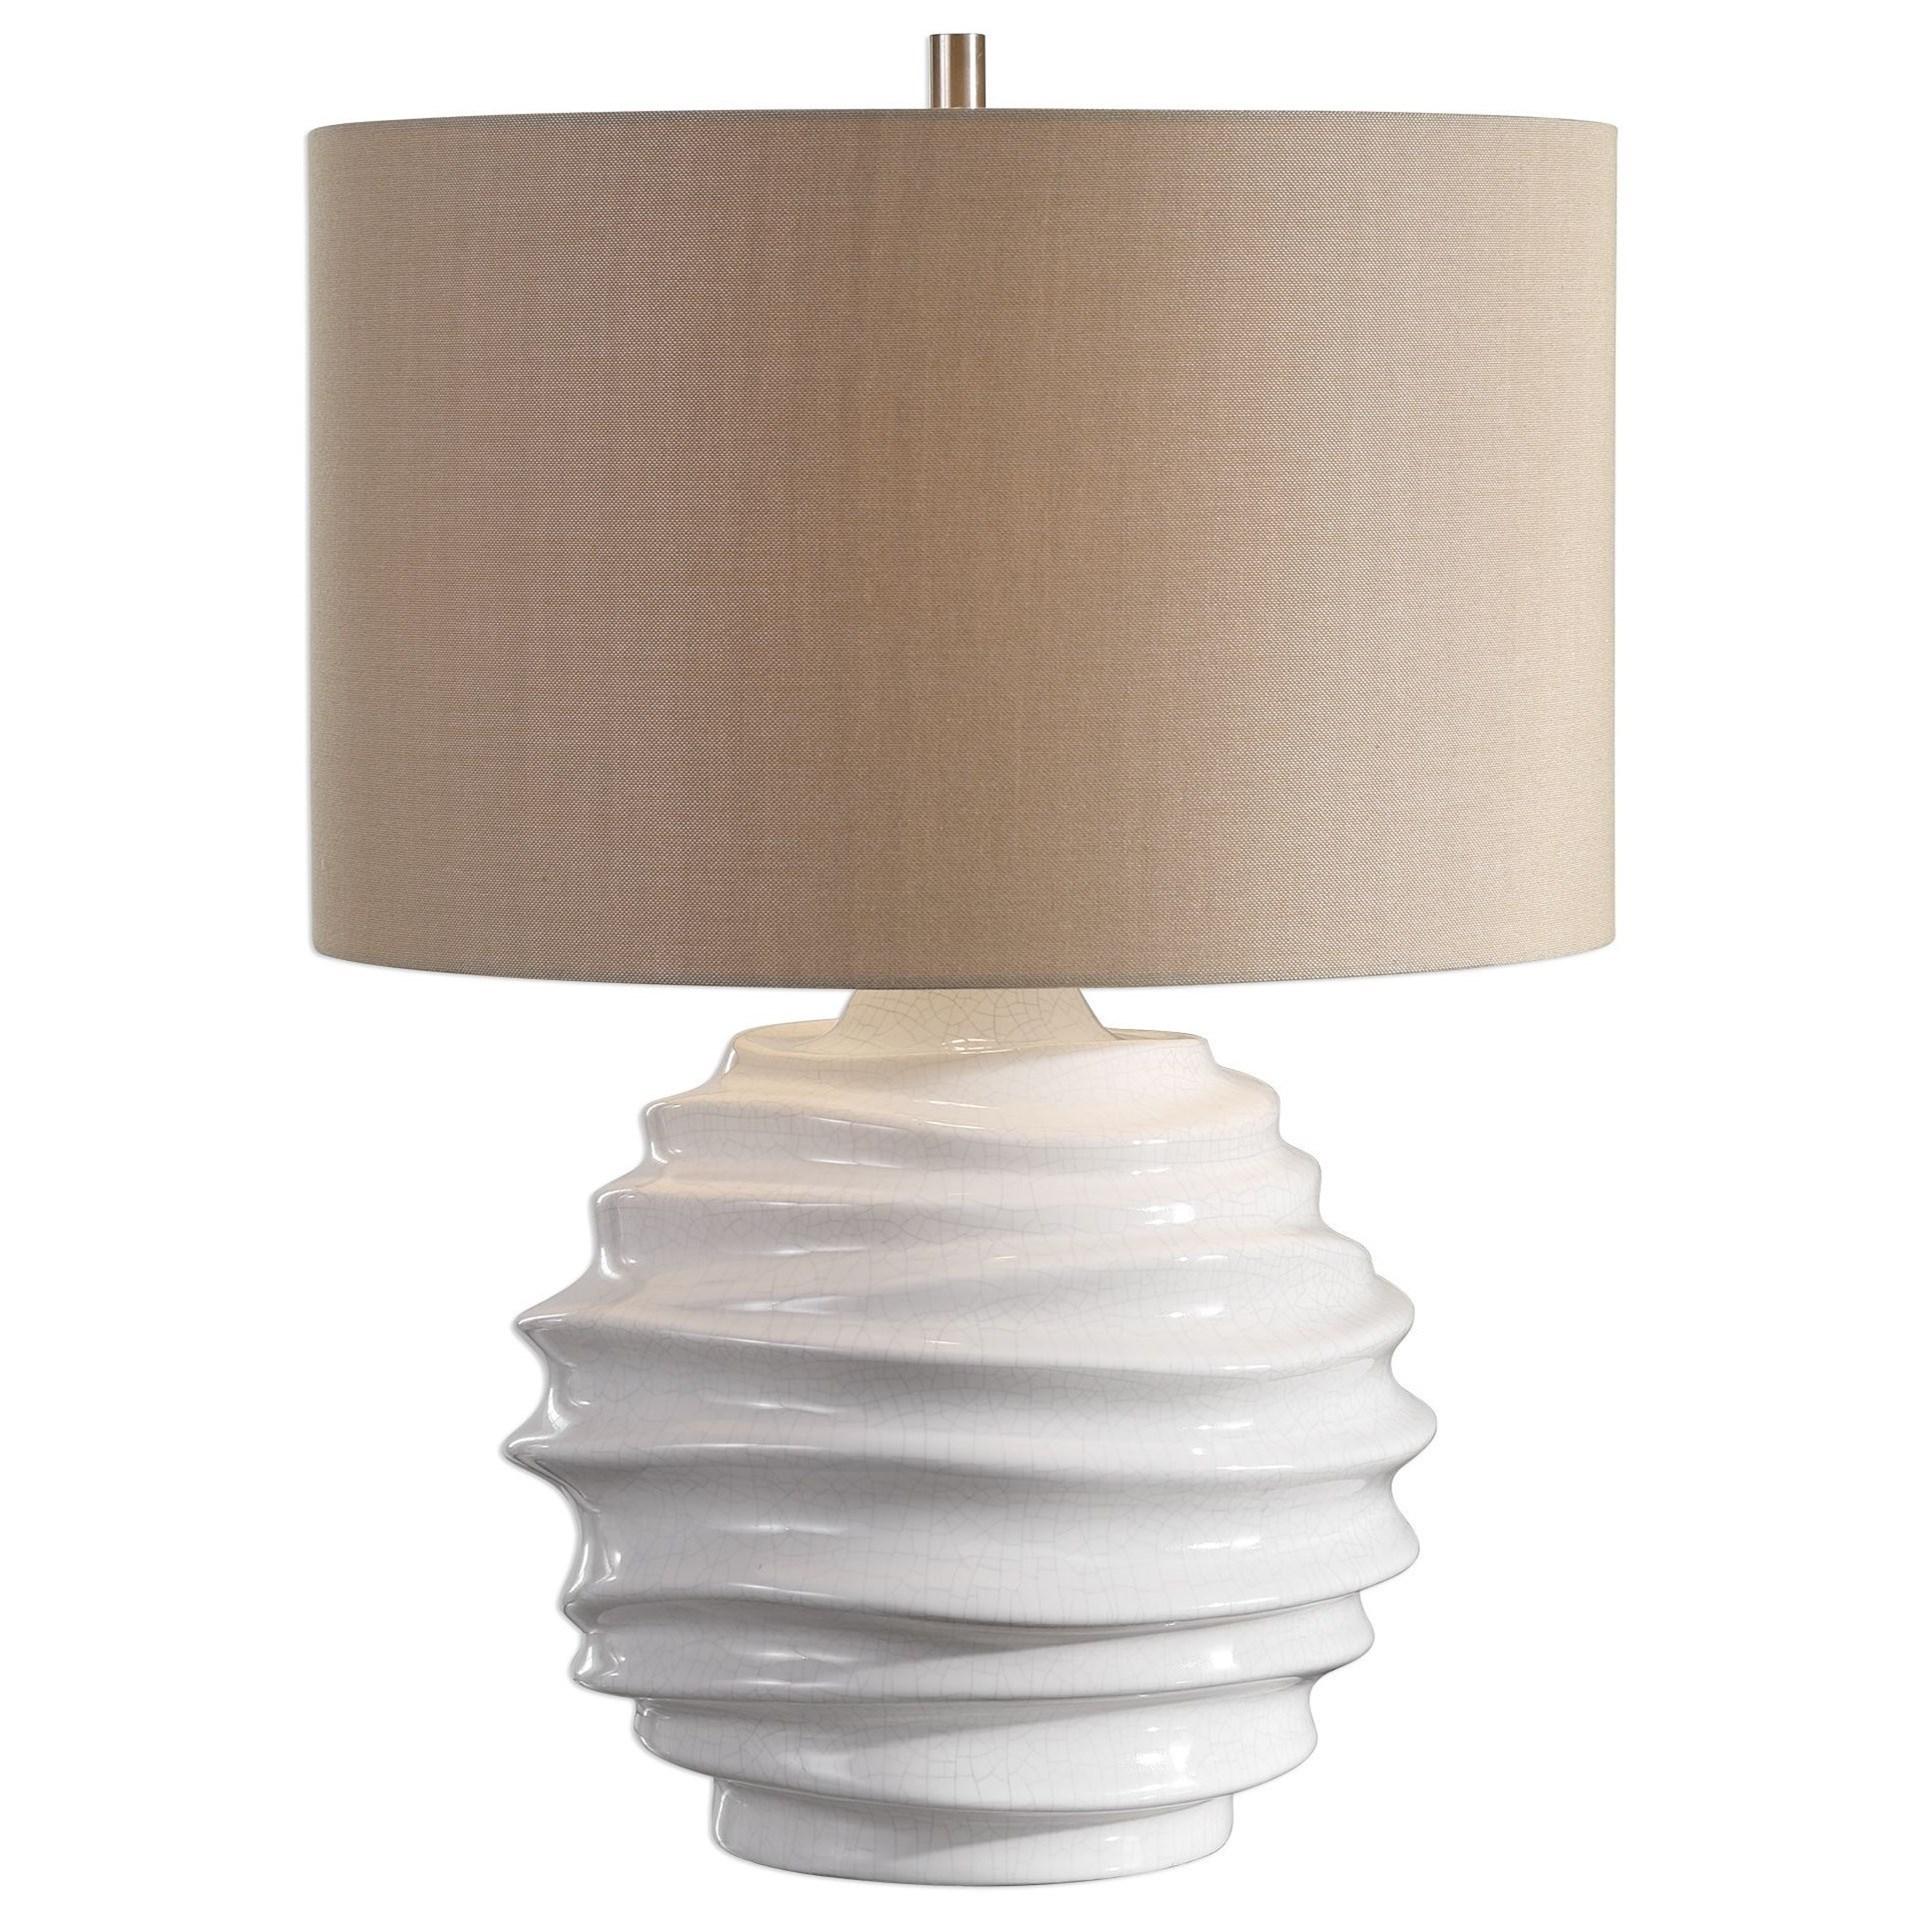 Gisasa Crackled White Lamp